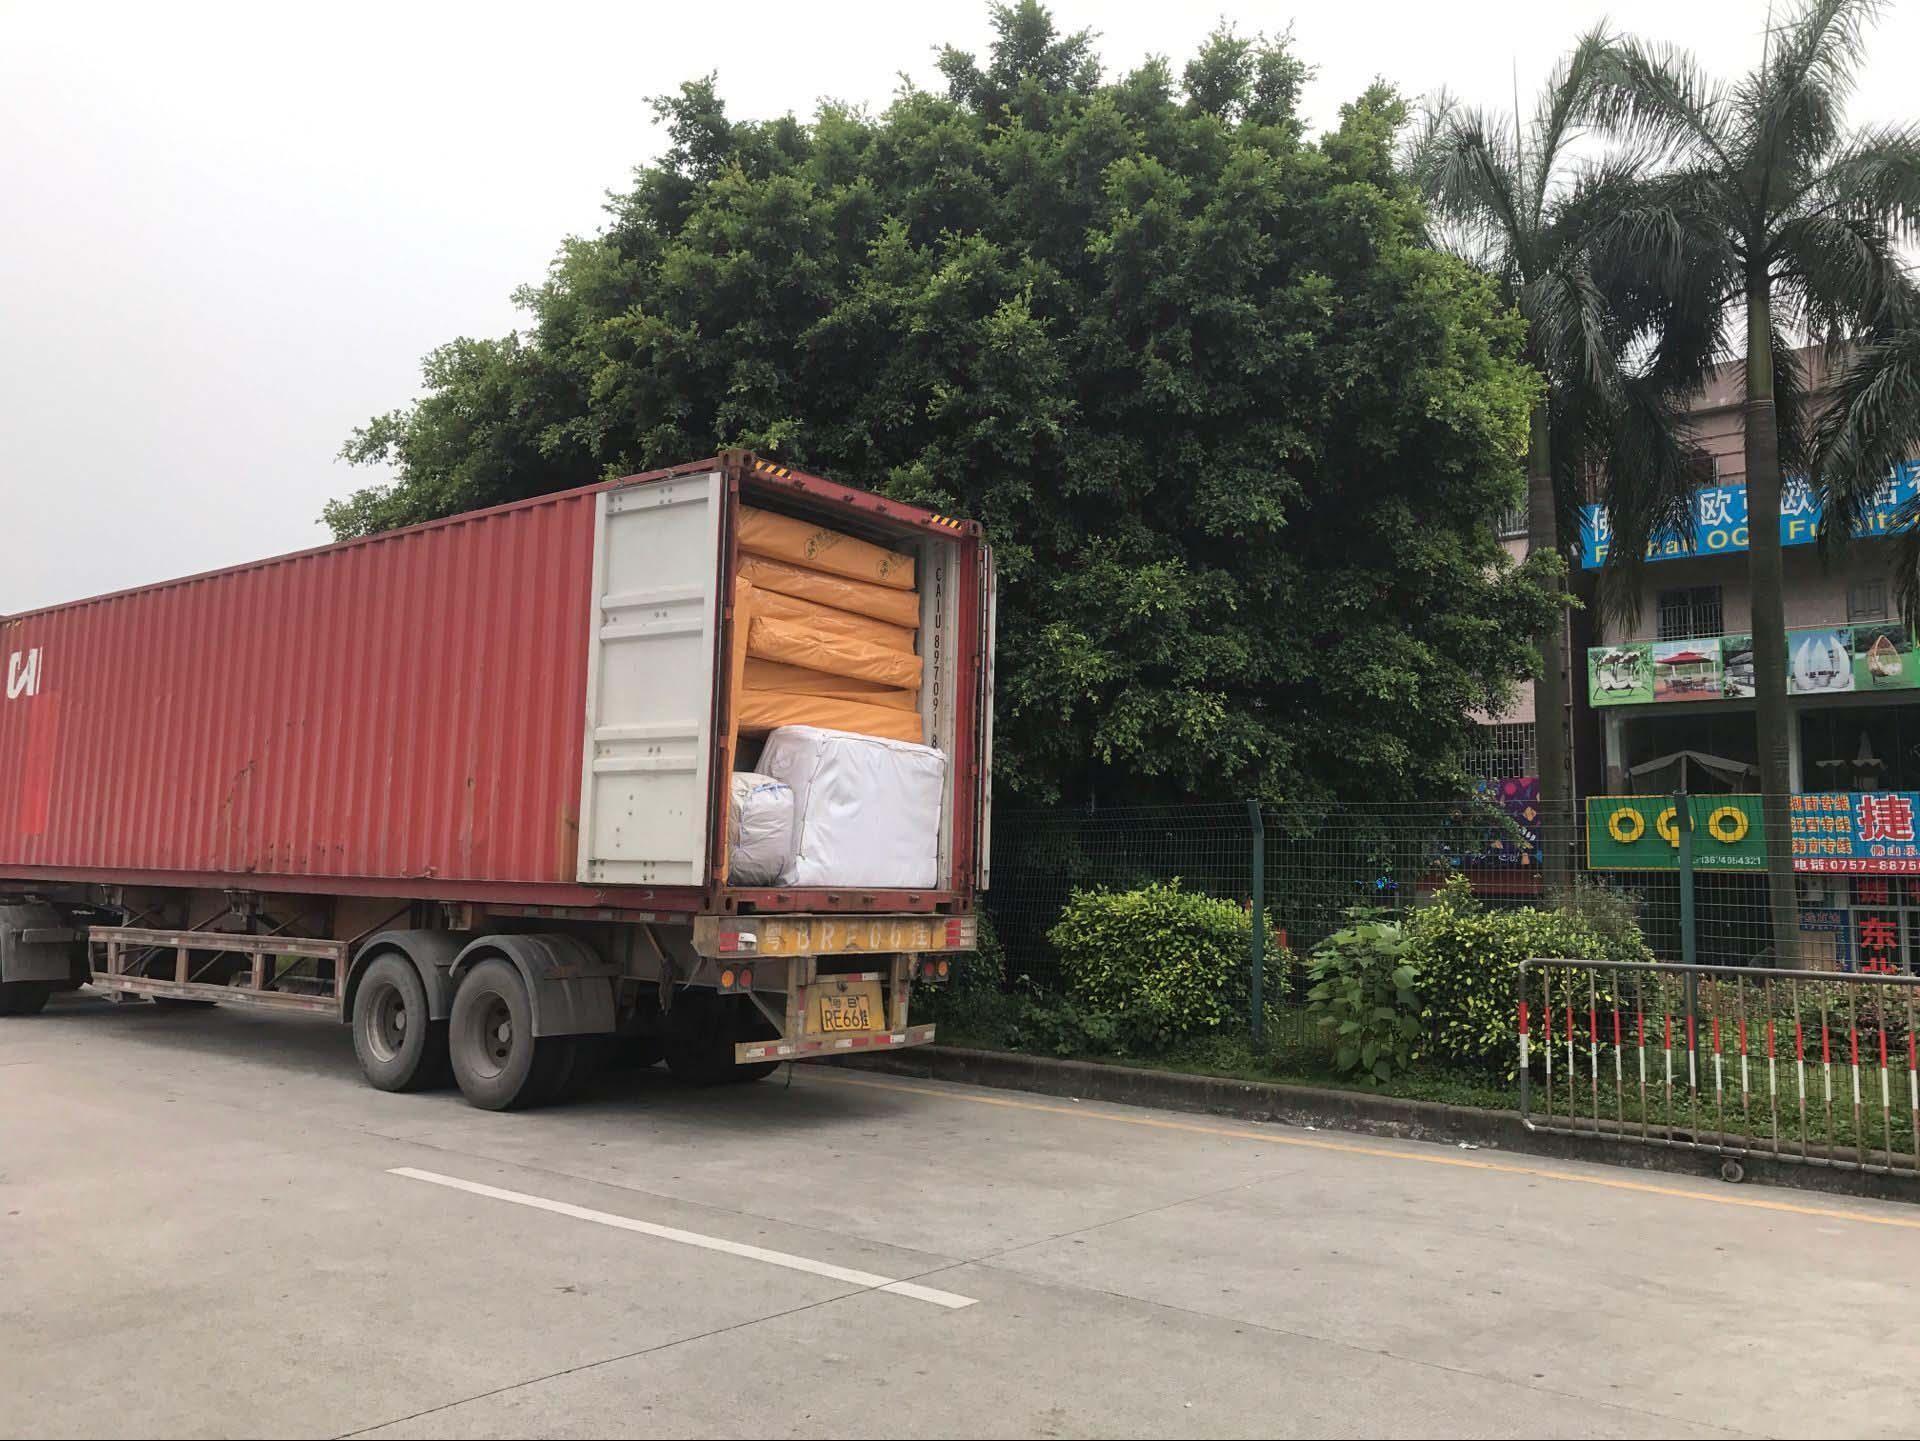 2017-5-19 Shipment India (Hotel engineering)